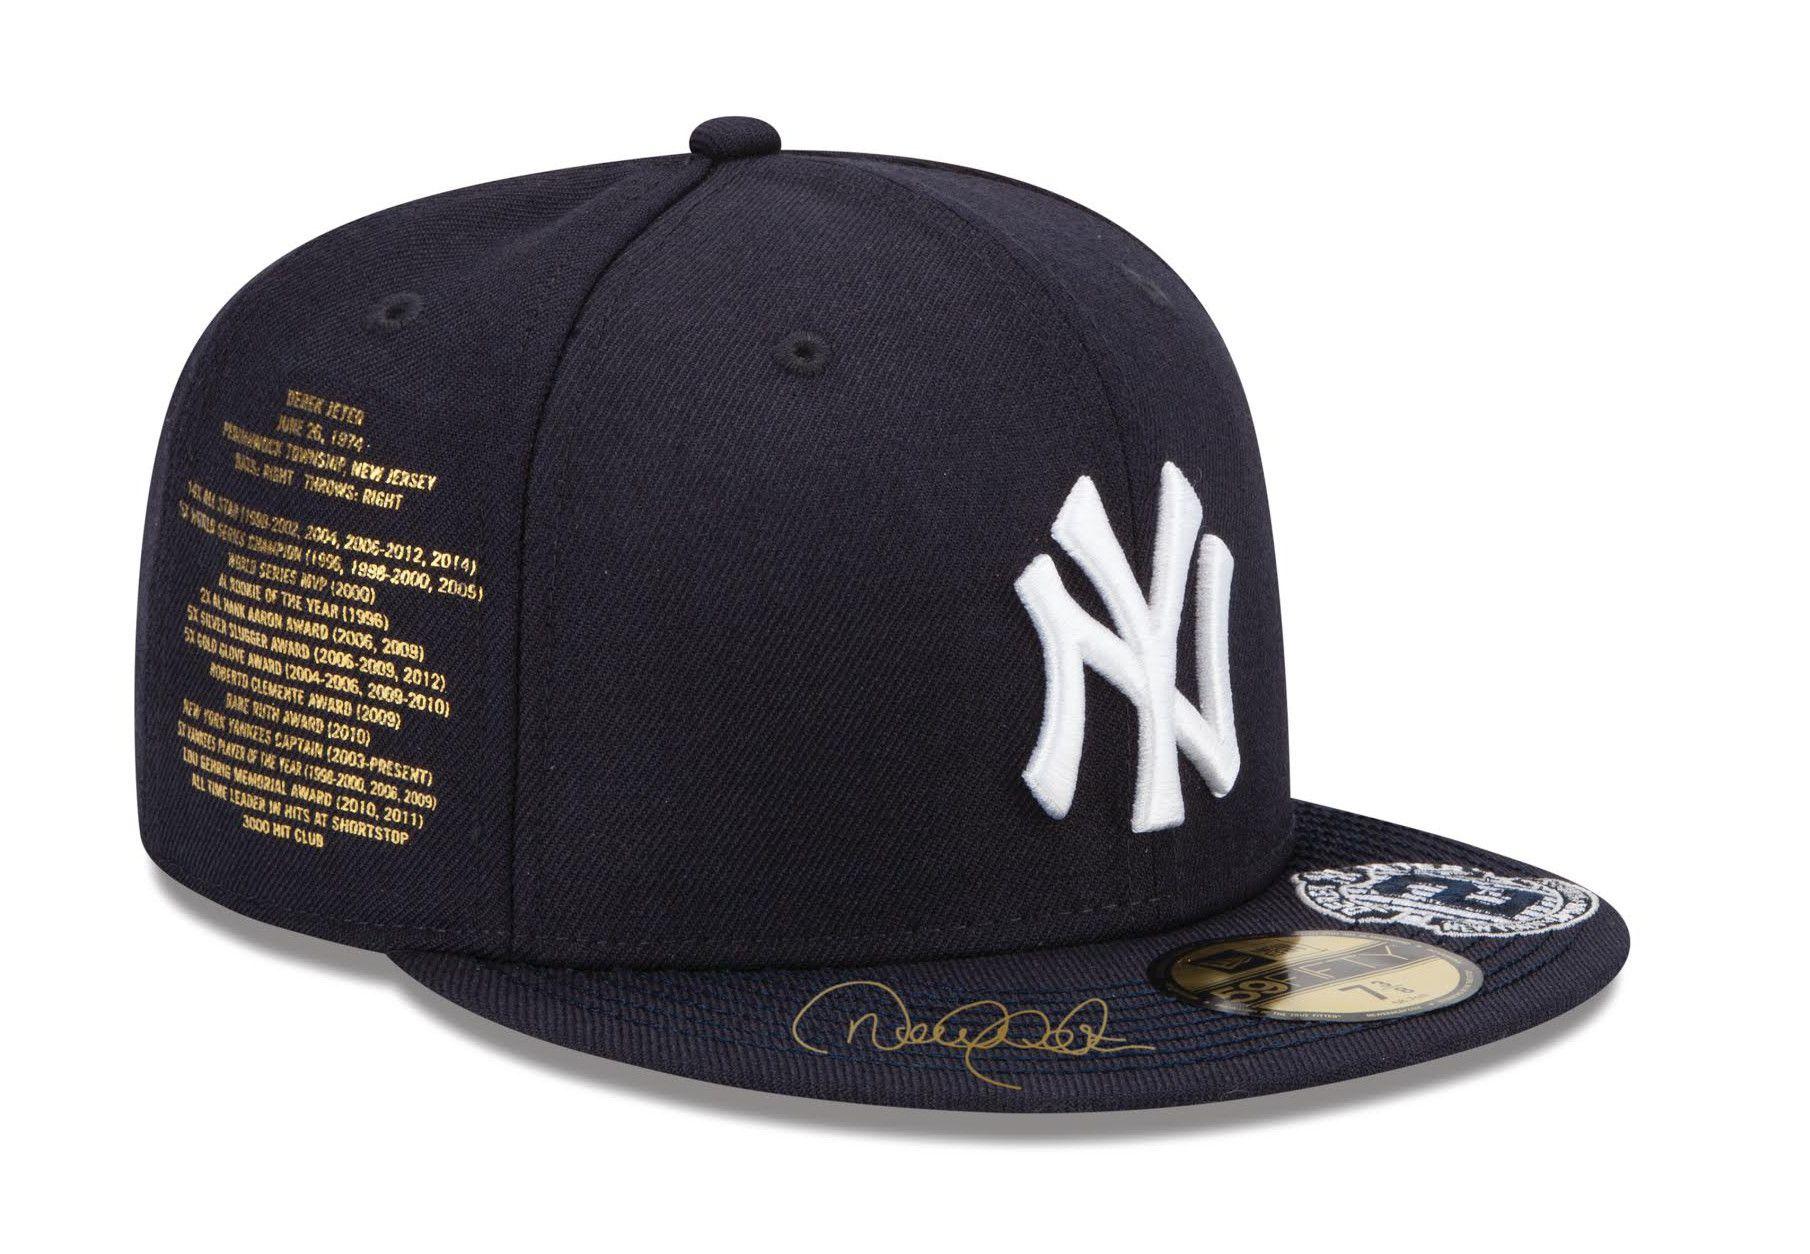 New Era For Atmos Nyc Ny Yankees Derek Jeter Fitted Hat Yankee Fitted Hats For Men Derek Jeter